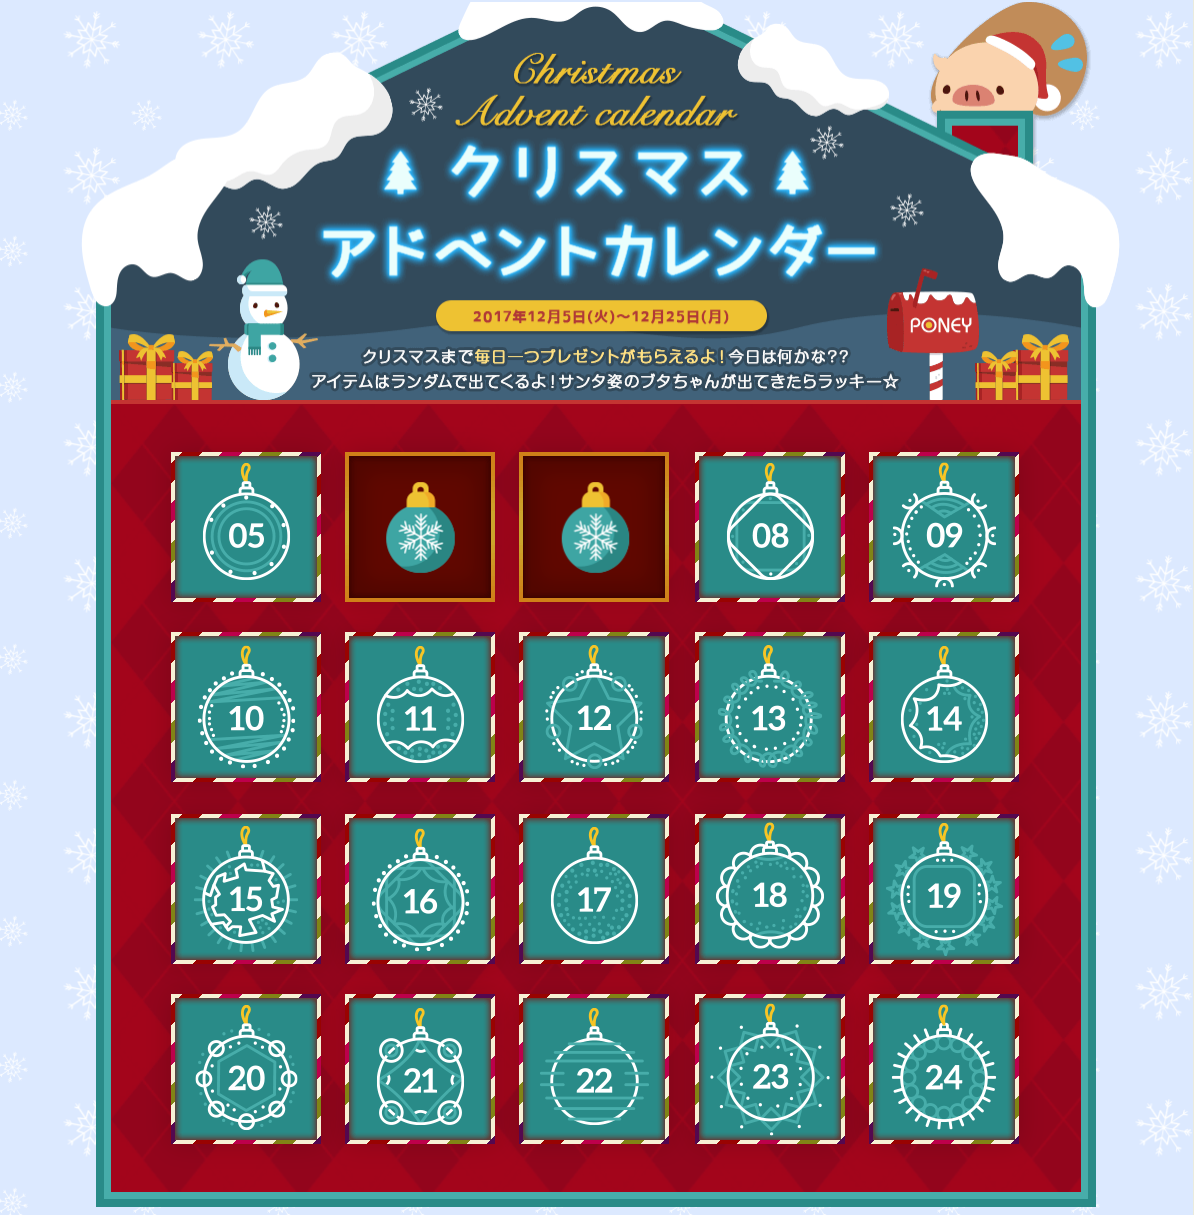 【PONEY】クリスマスアドベントカレンダー始まってます!